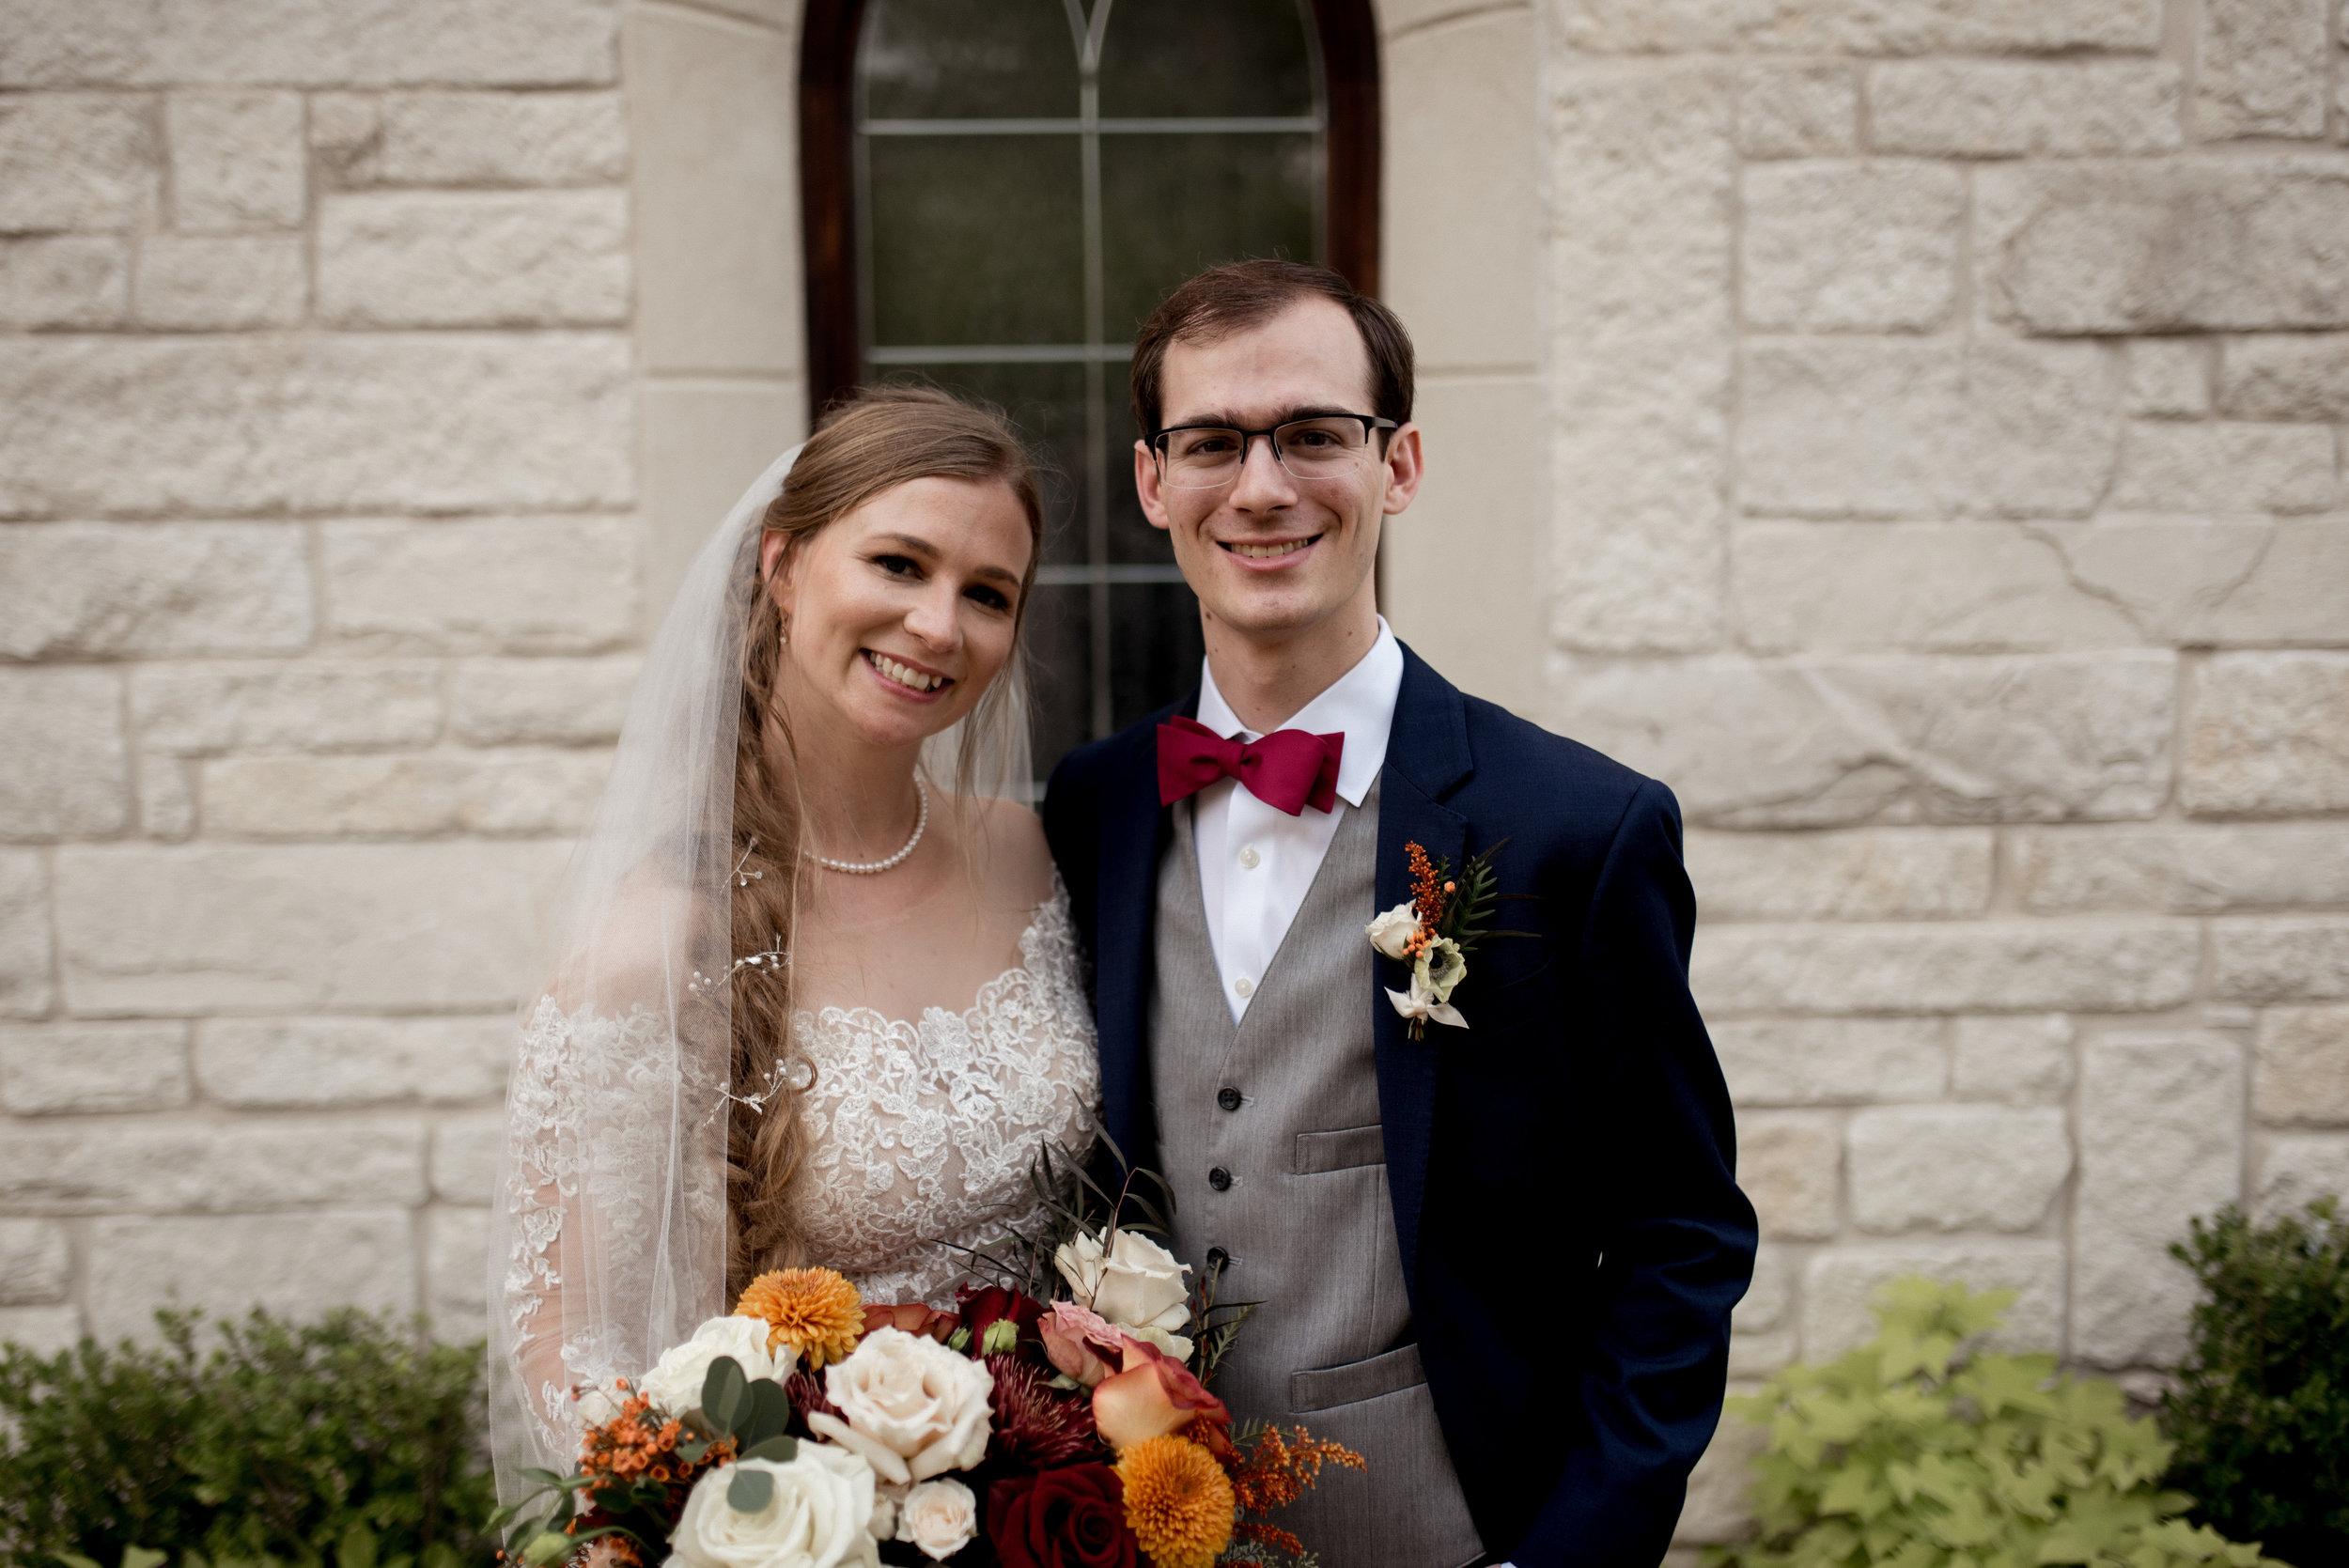 Artigues Wedding-255.jpg